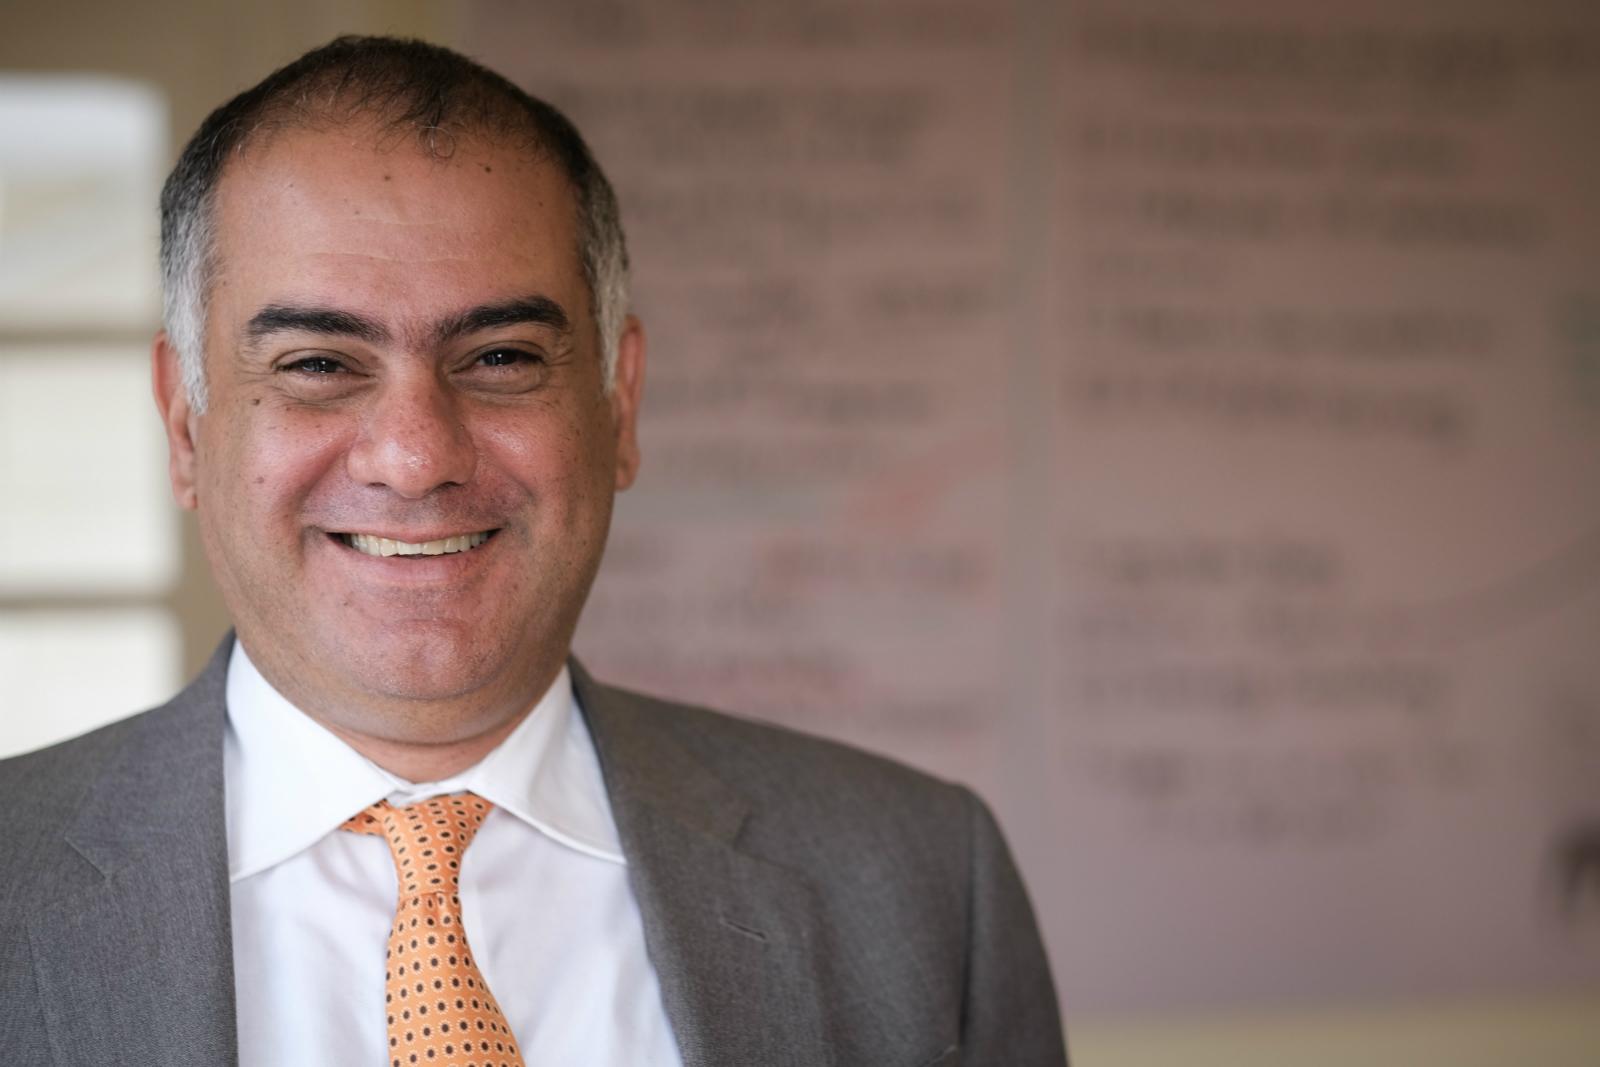 Amr Fawzi goodsmart receives the additional funding from algebra